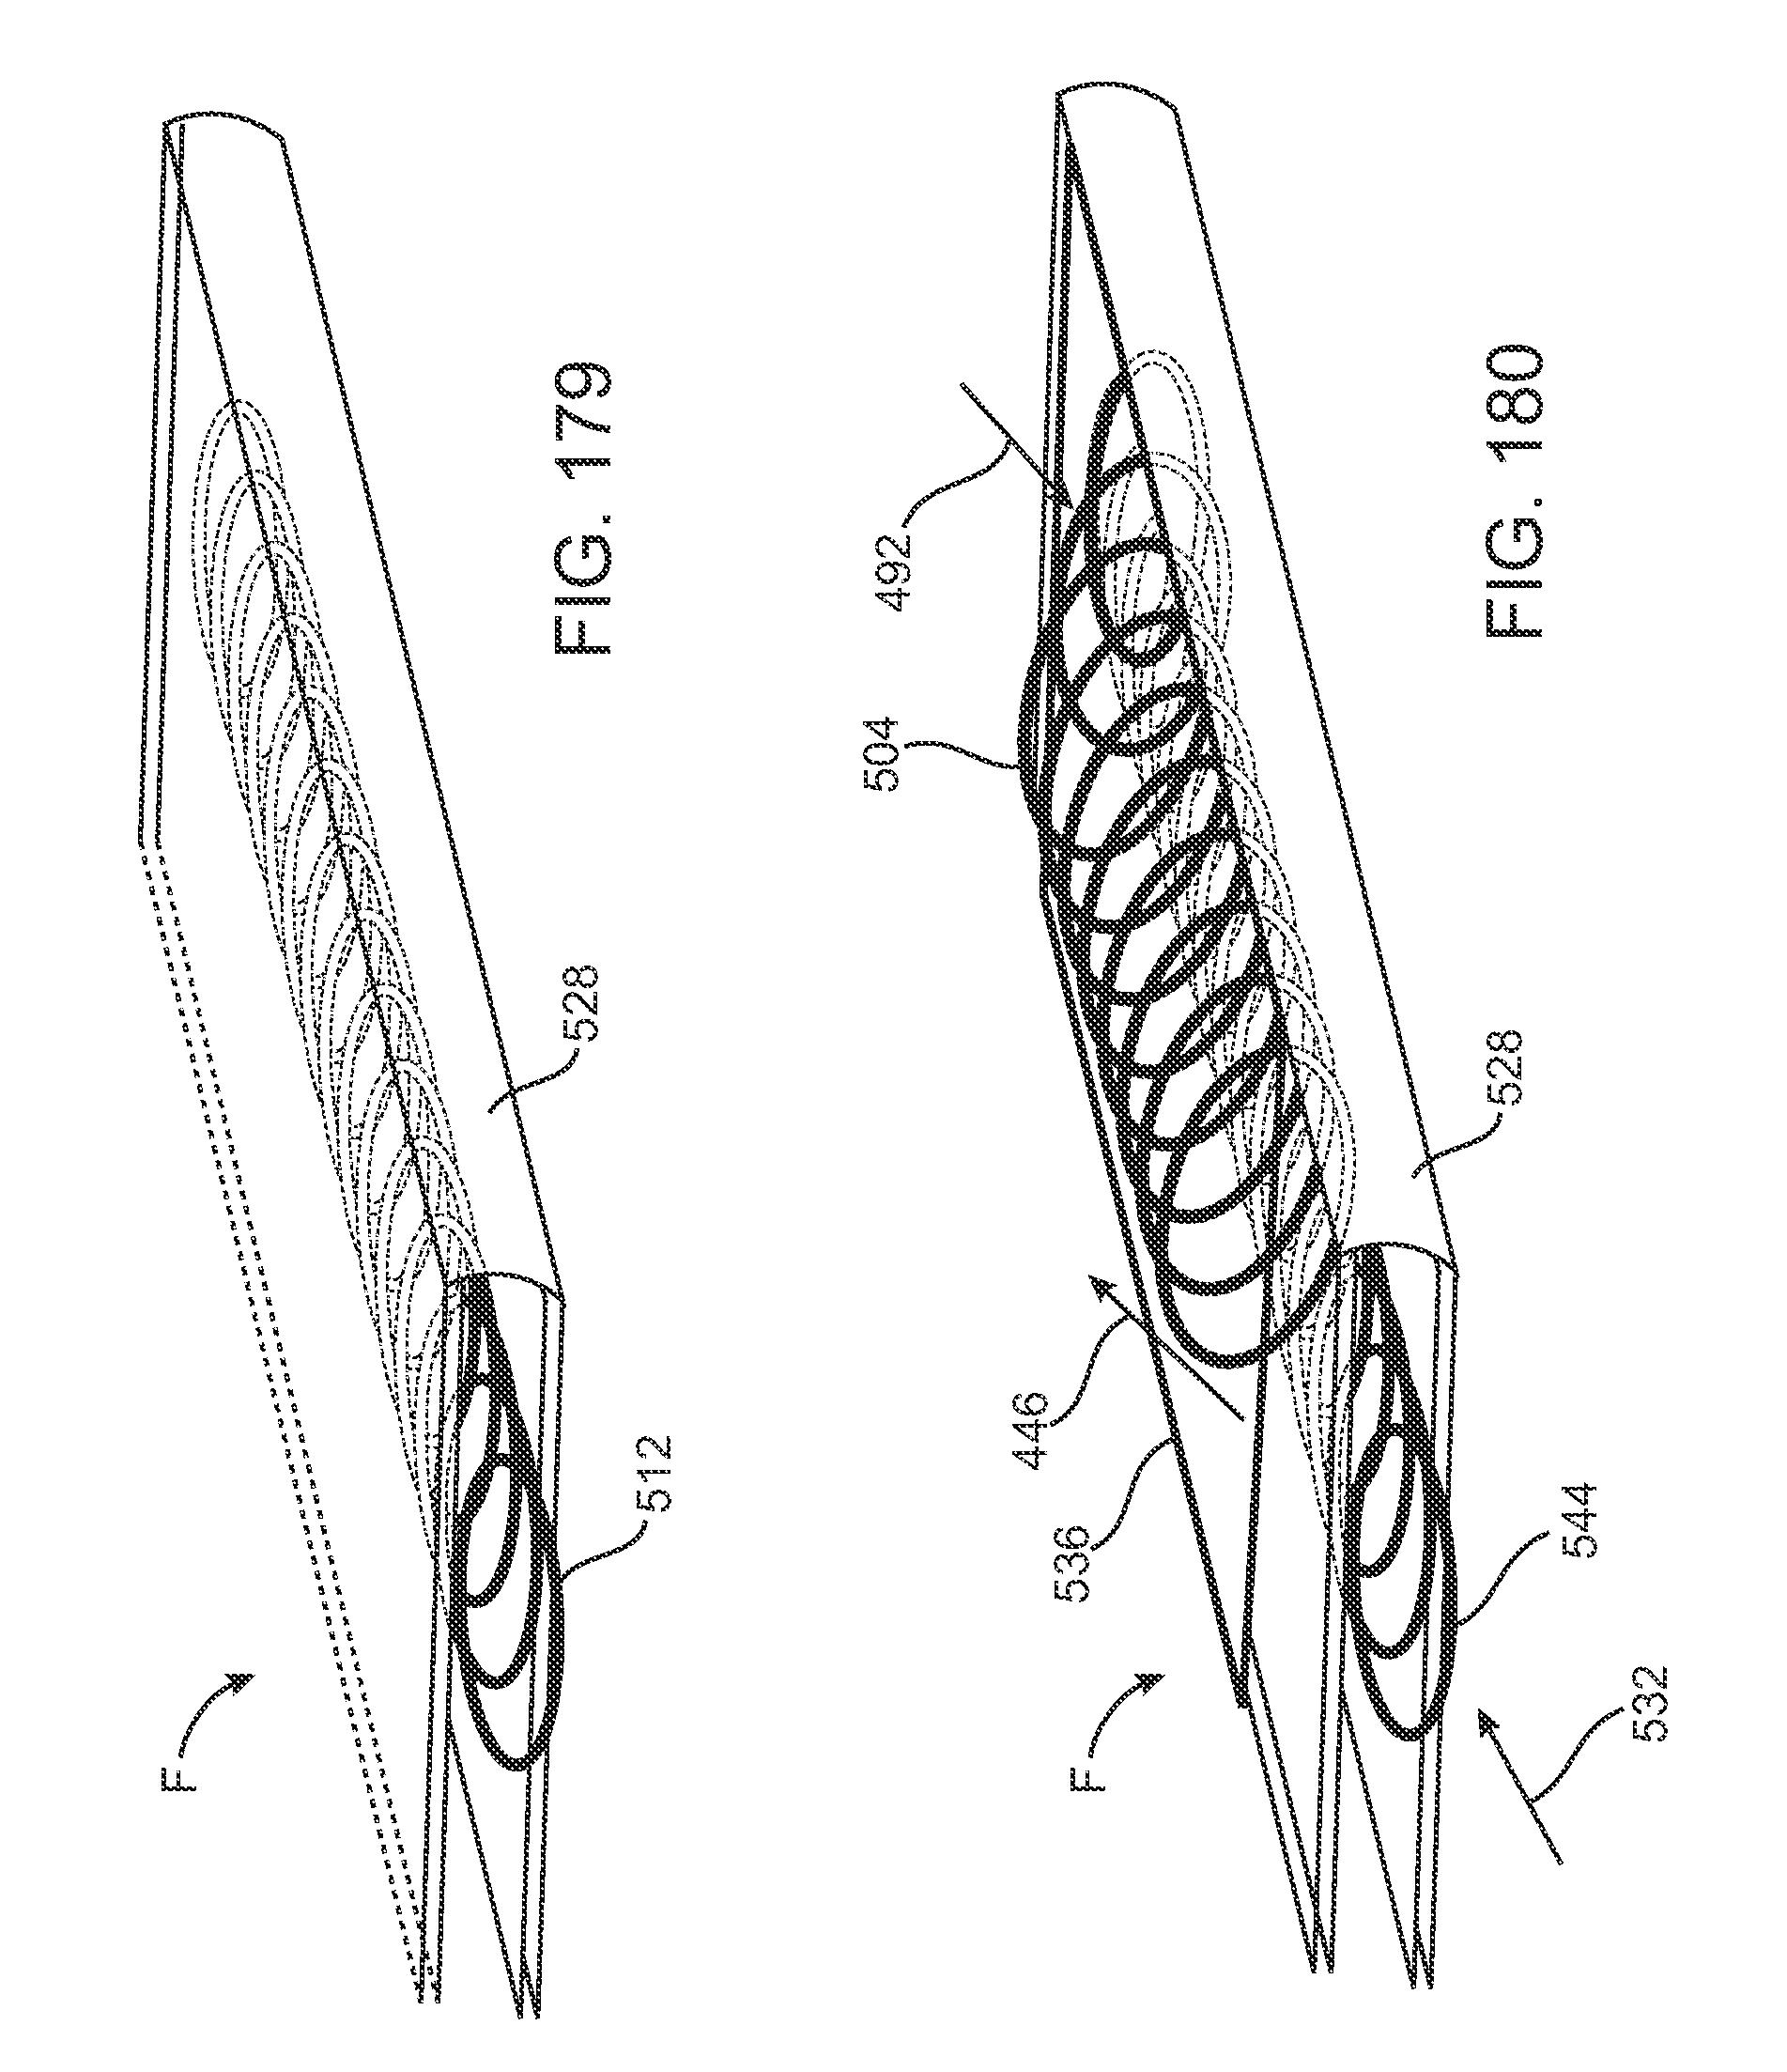 Patent US 8,192,435 B2